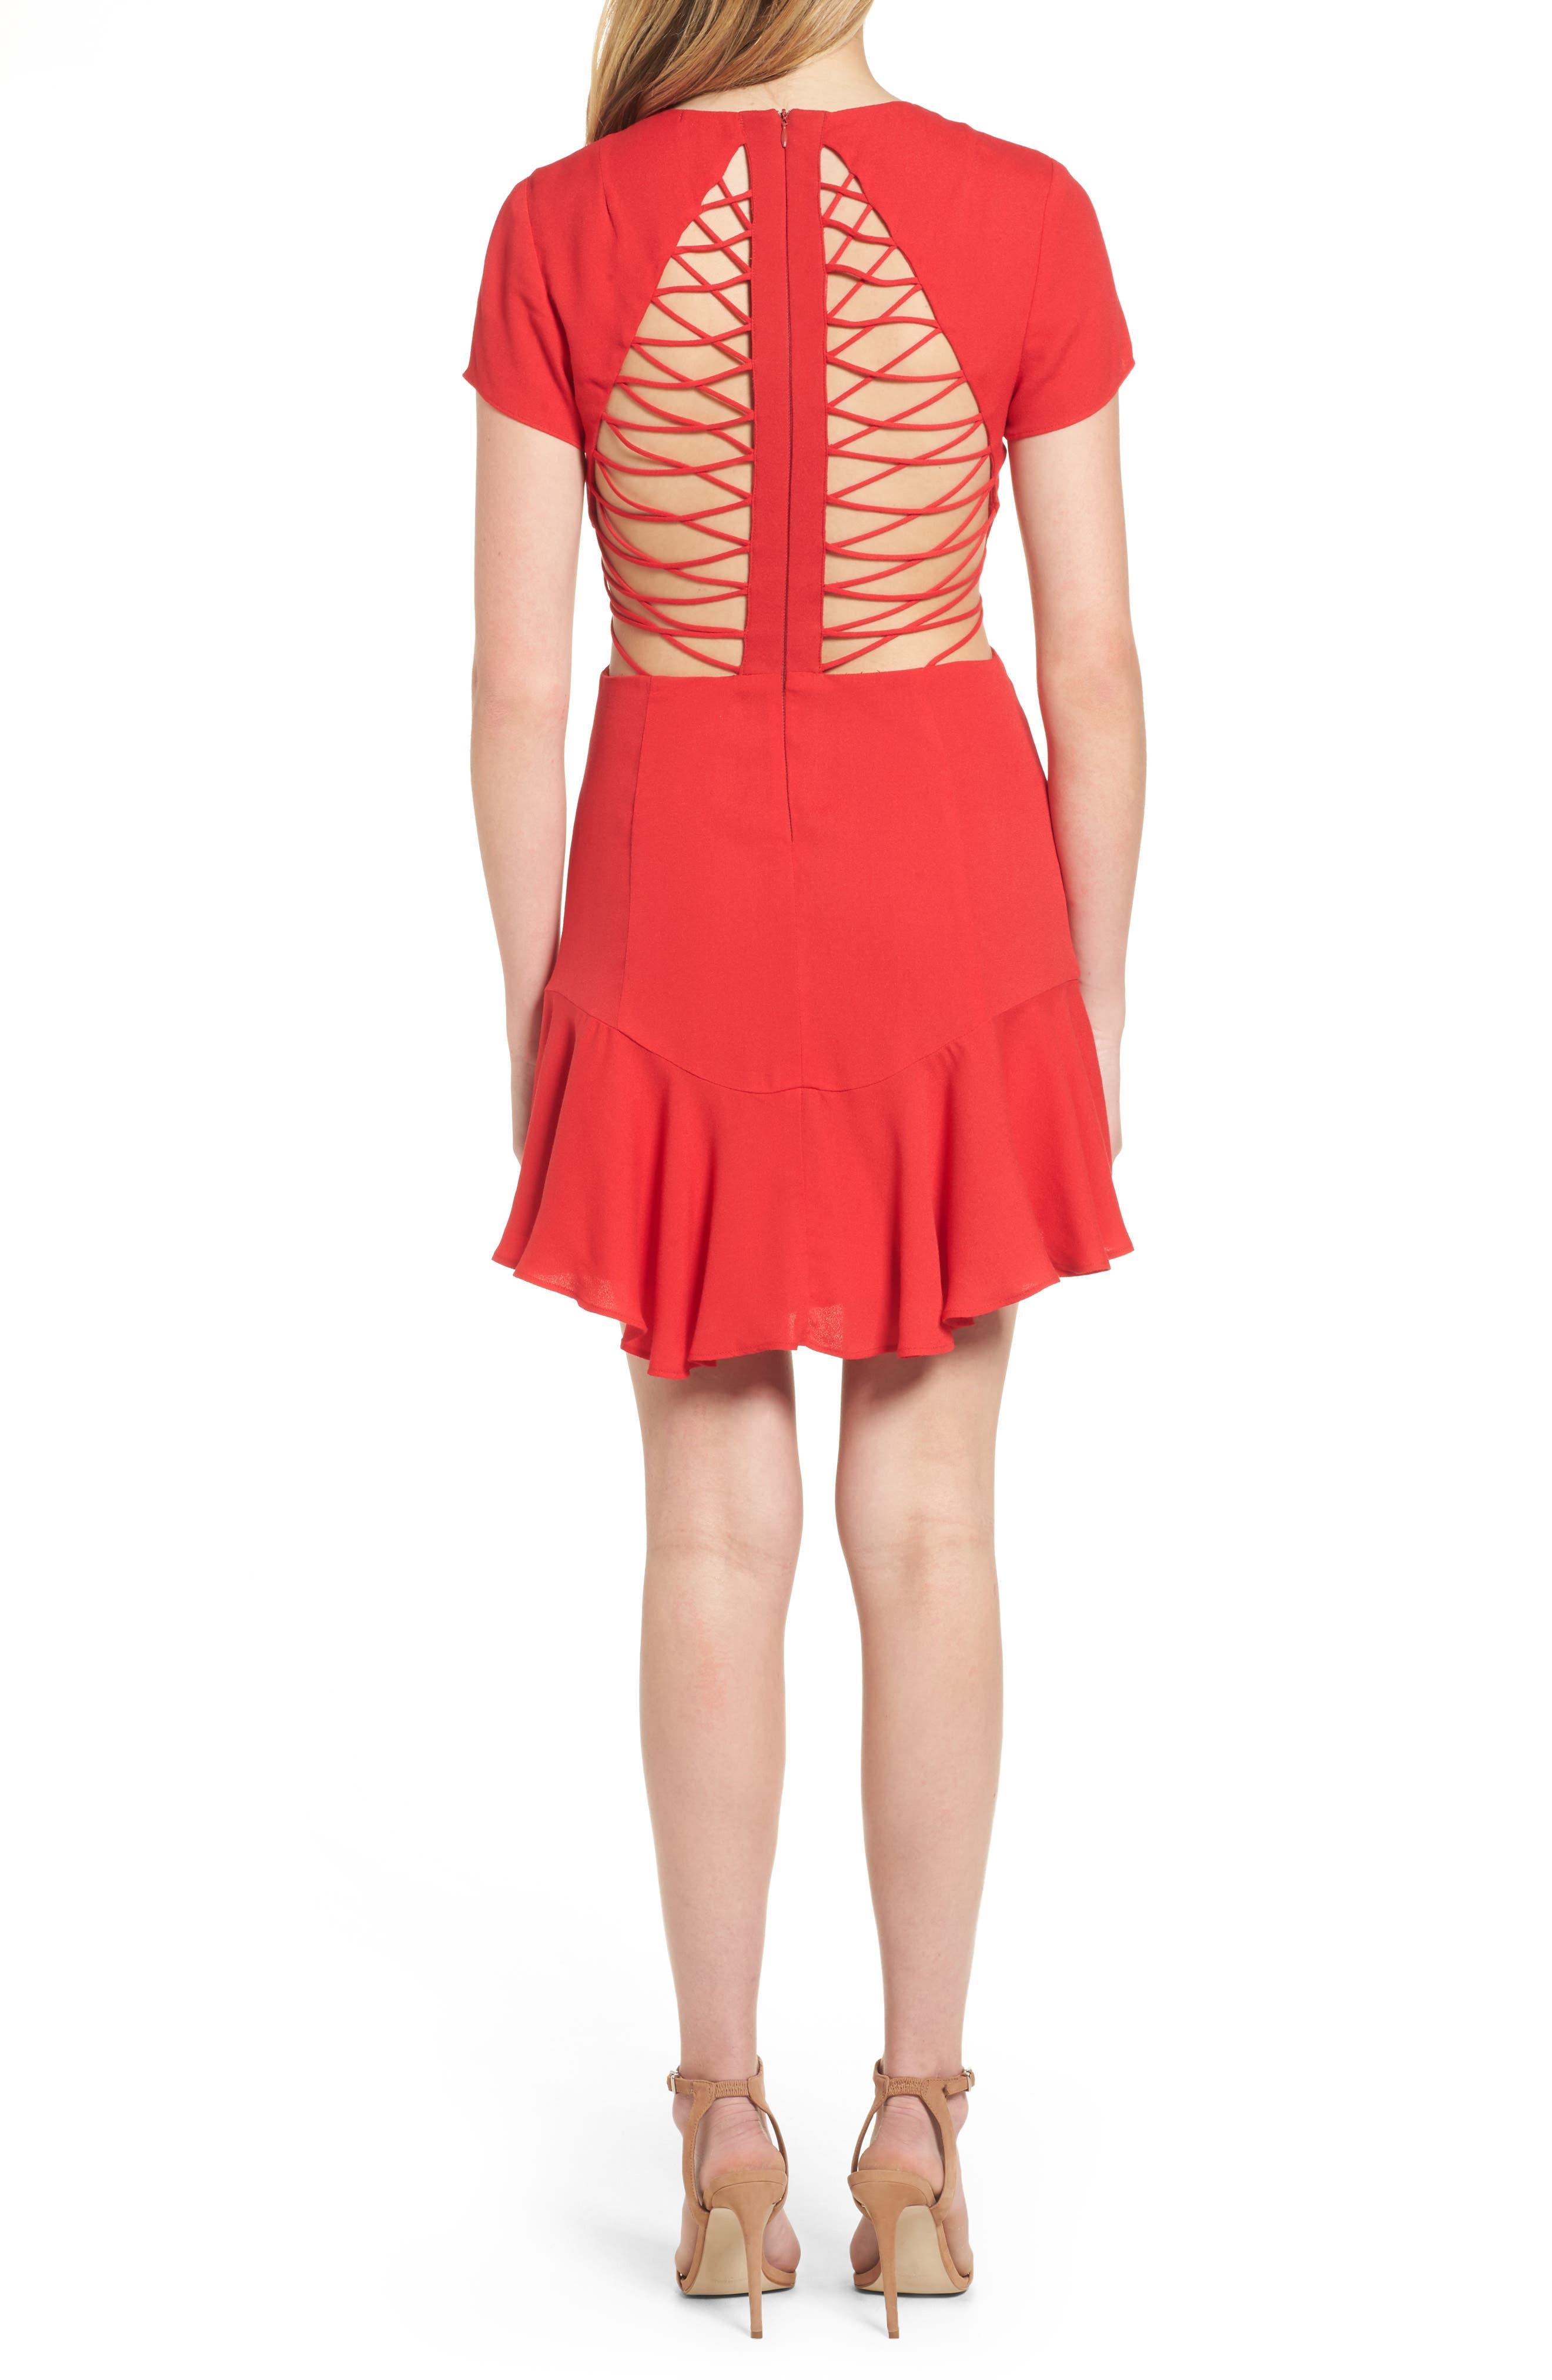 Main Image - AFRM Chelsea Lattice Back Fit & Flare Dress